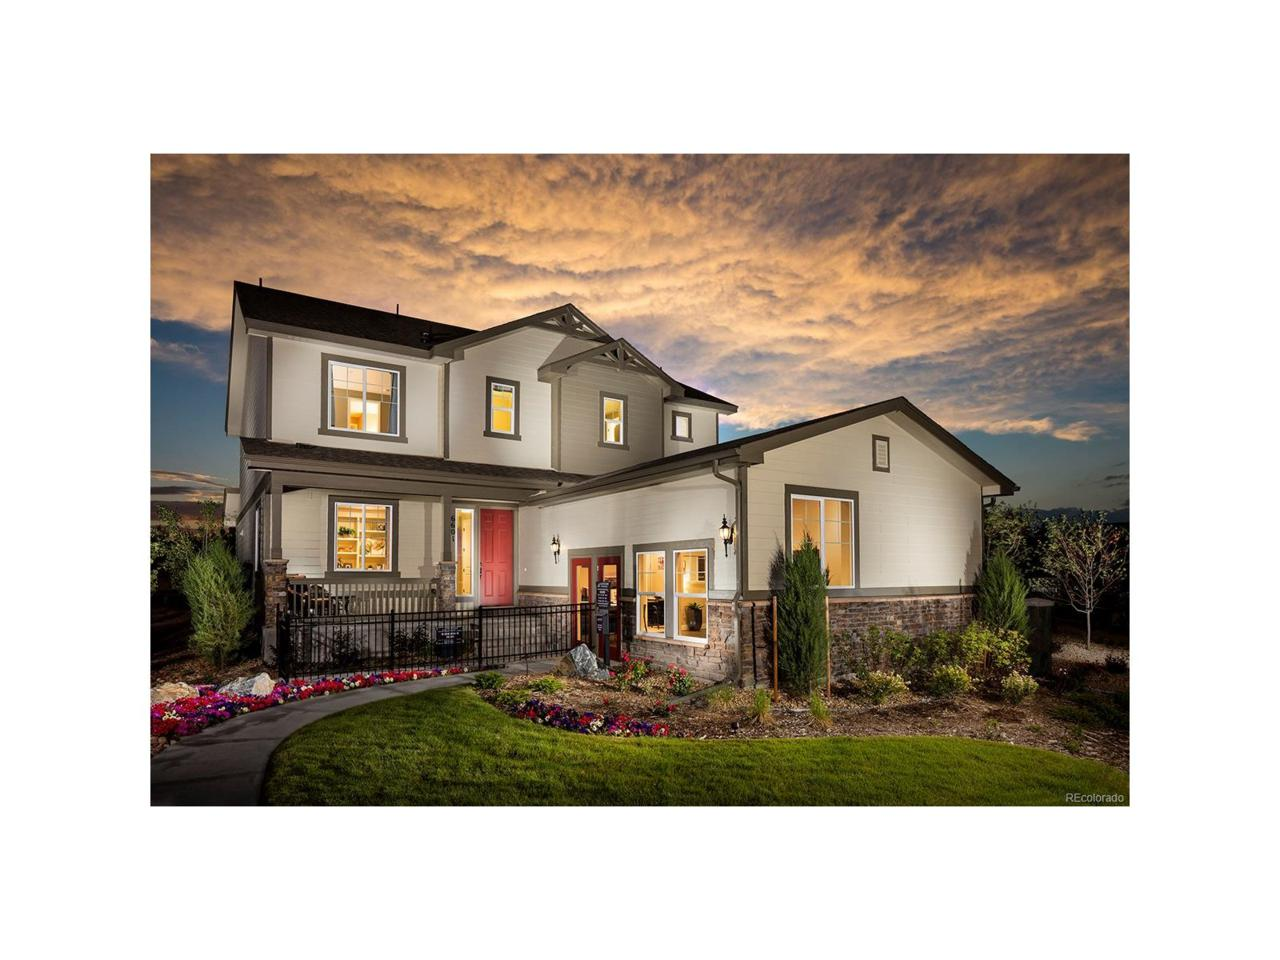 6601 S Newbern Street, Aurora, CO 80016 (MLS #2923628) :: 8z Real Estate